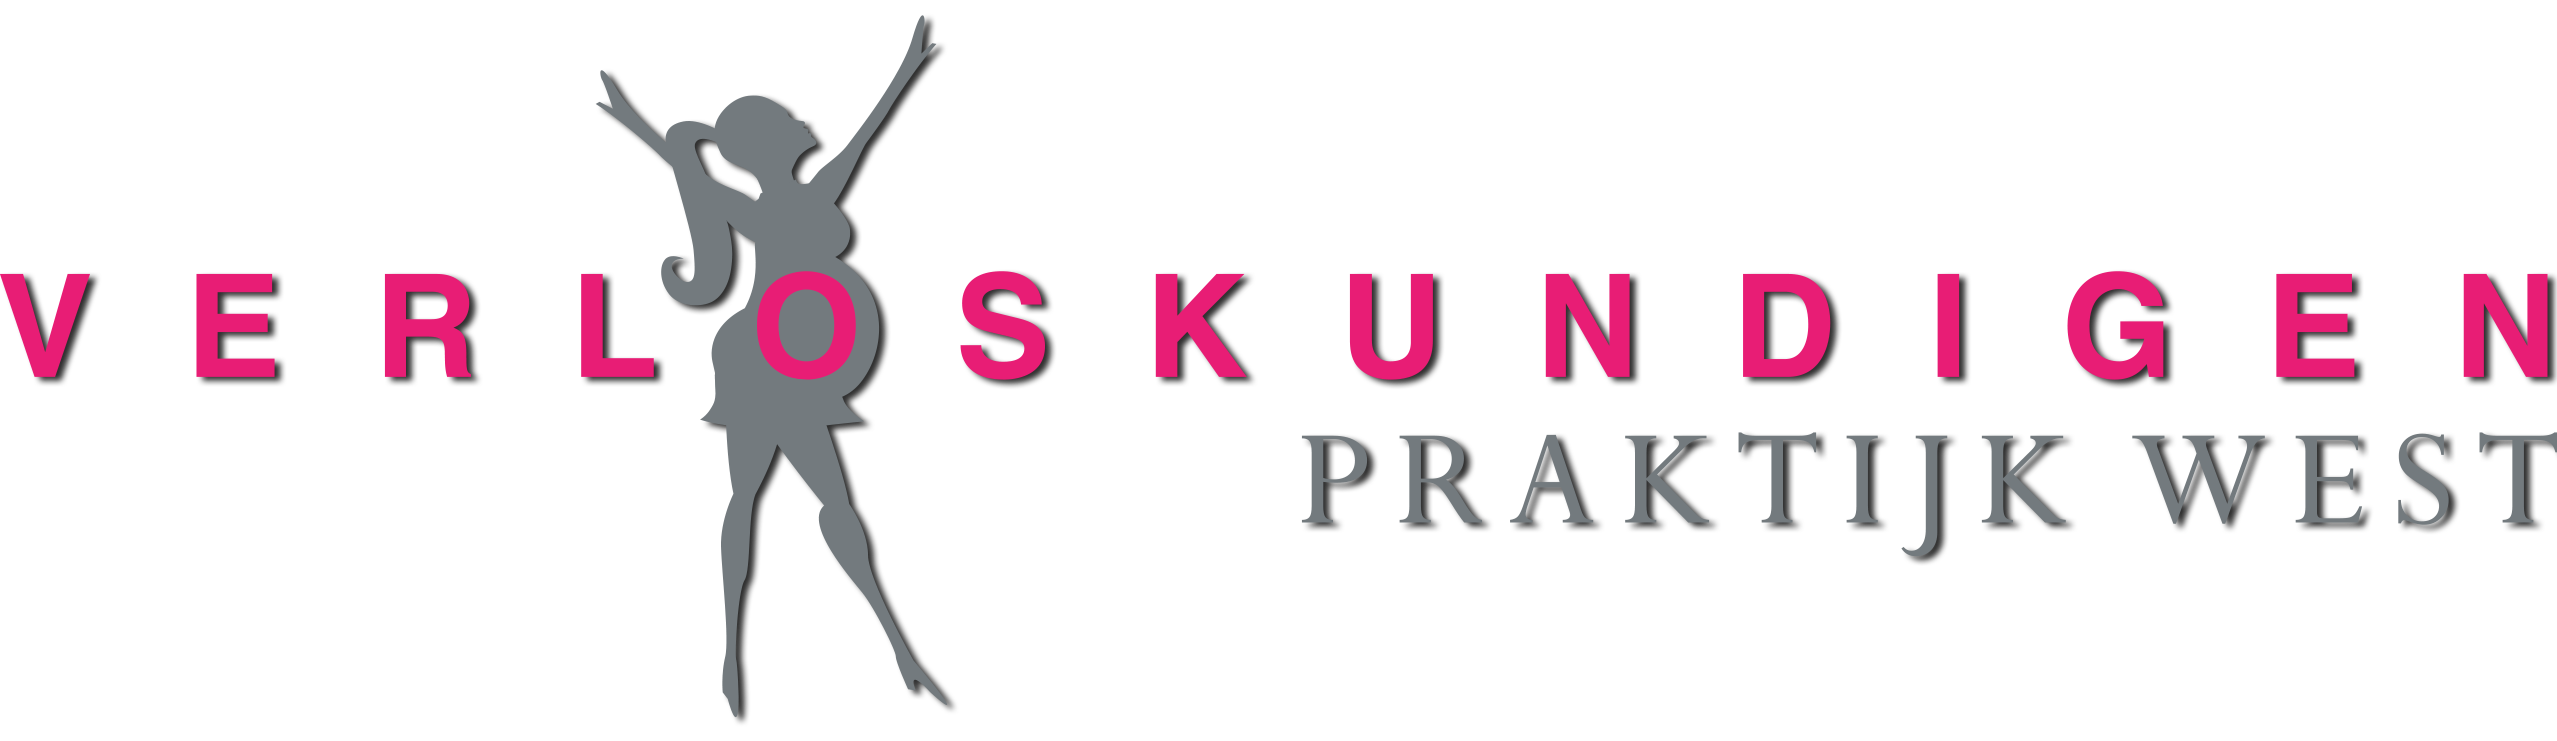 logo-2019-schaduw